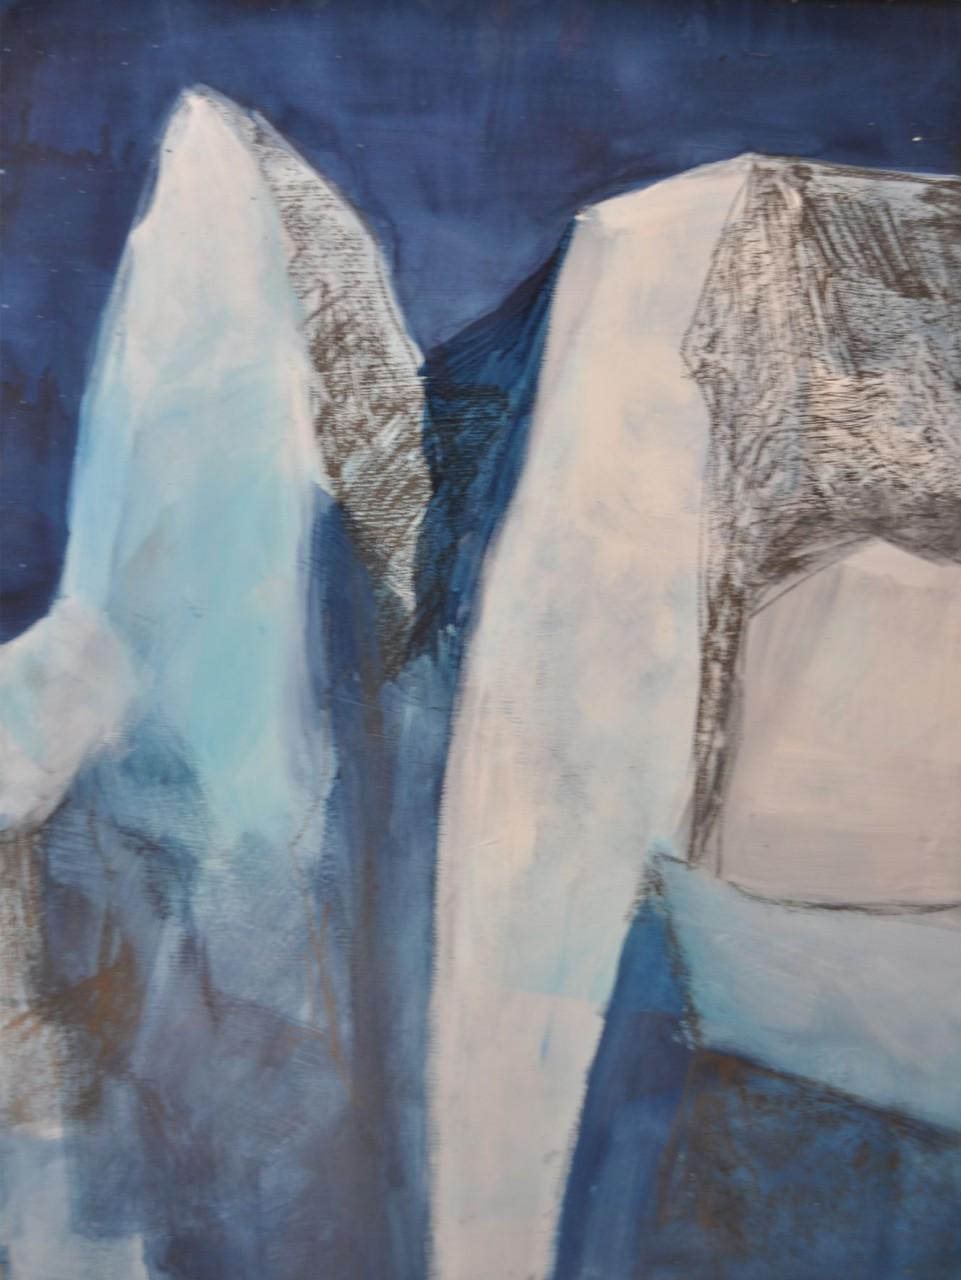 moreno gletscher 4